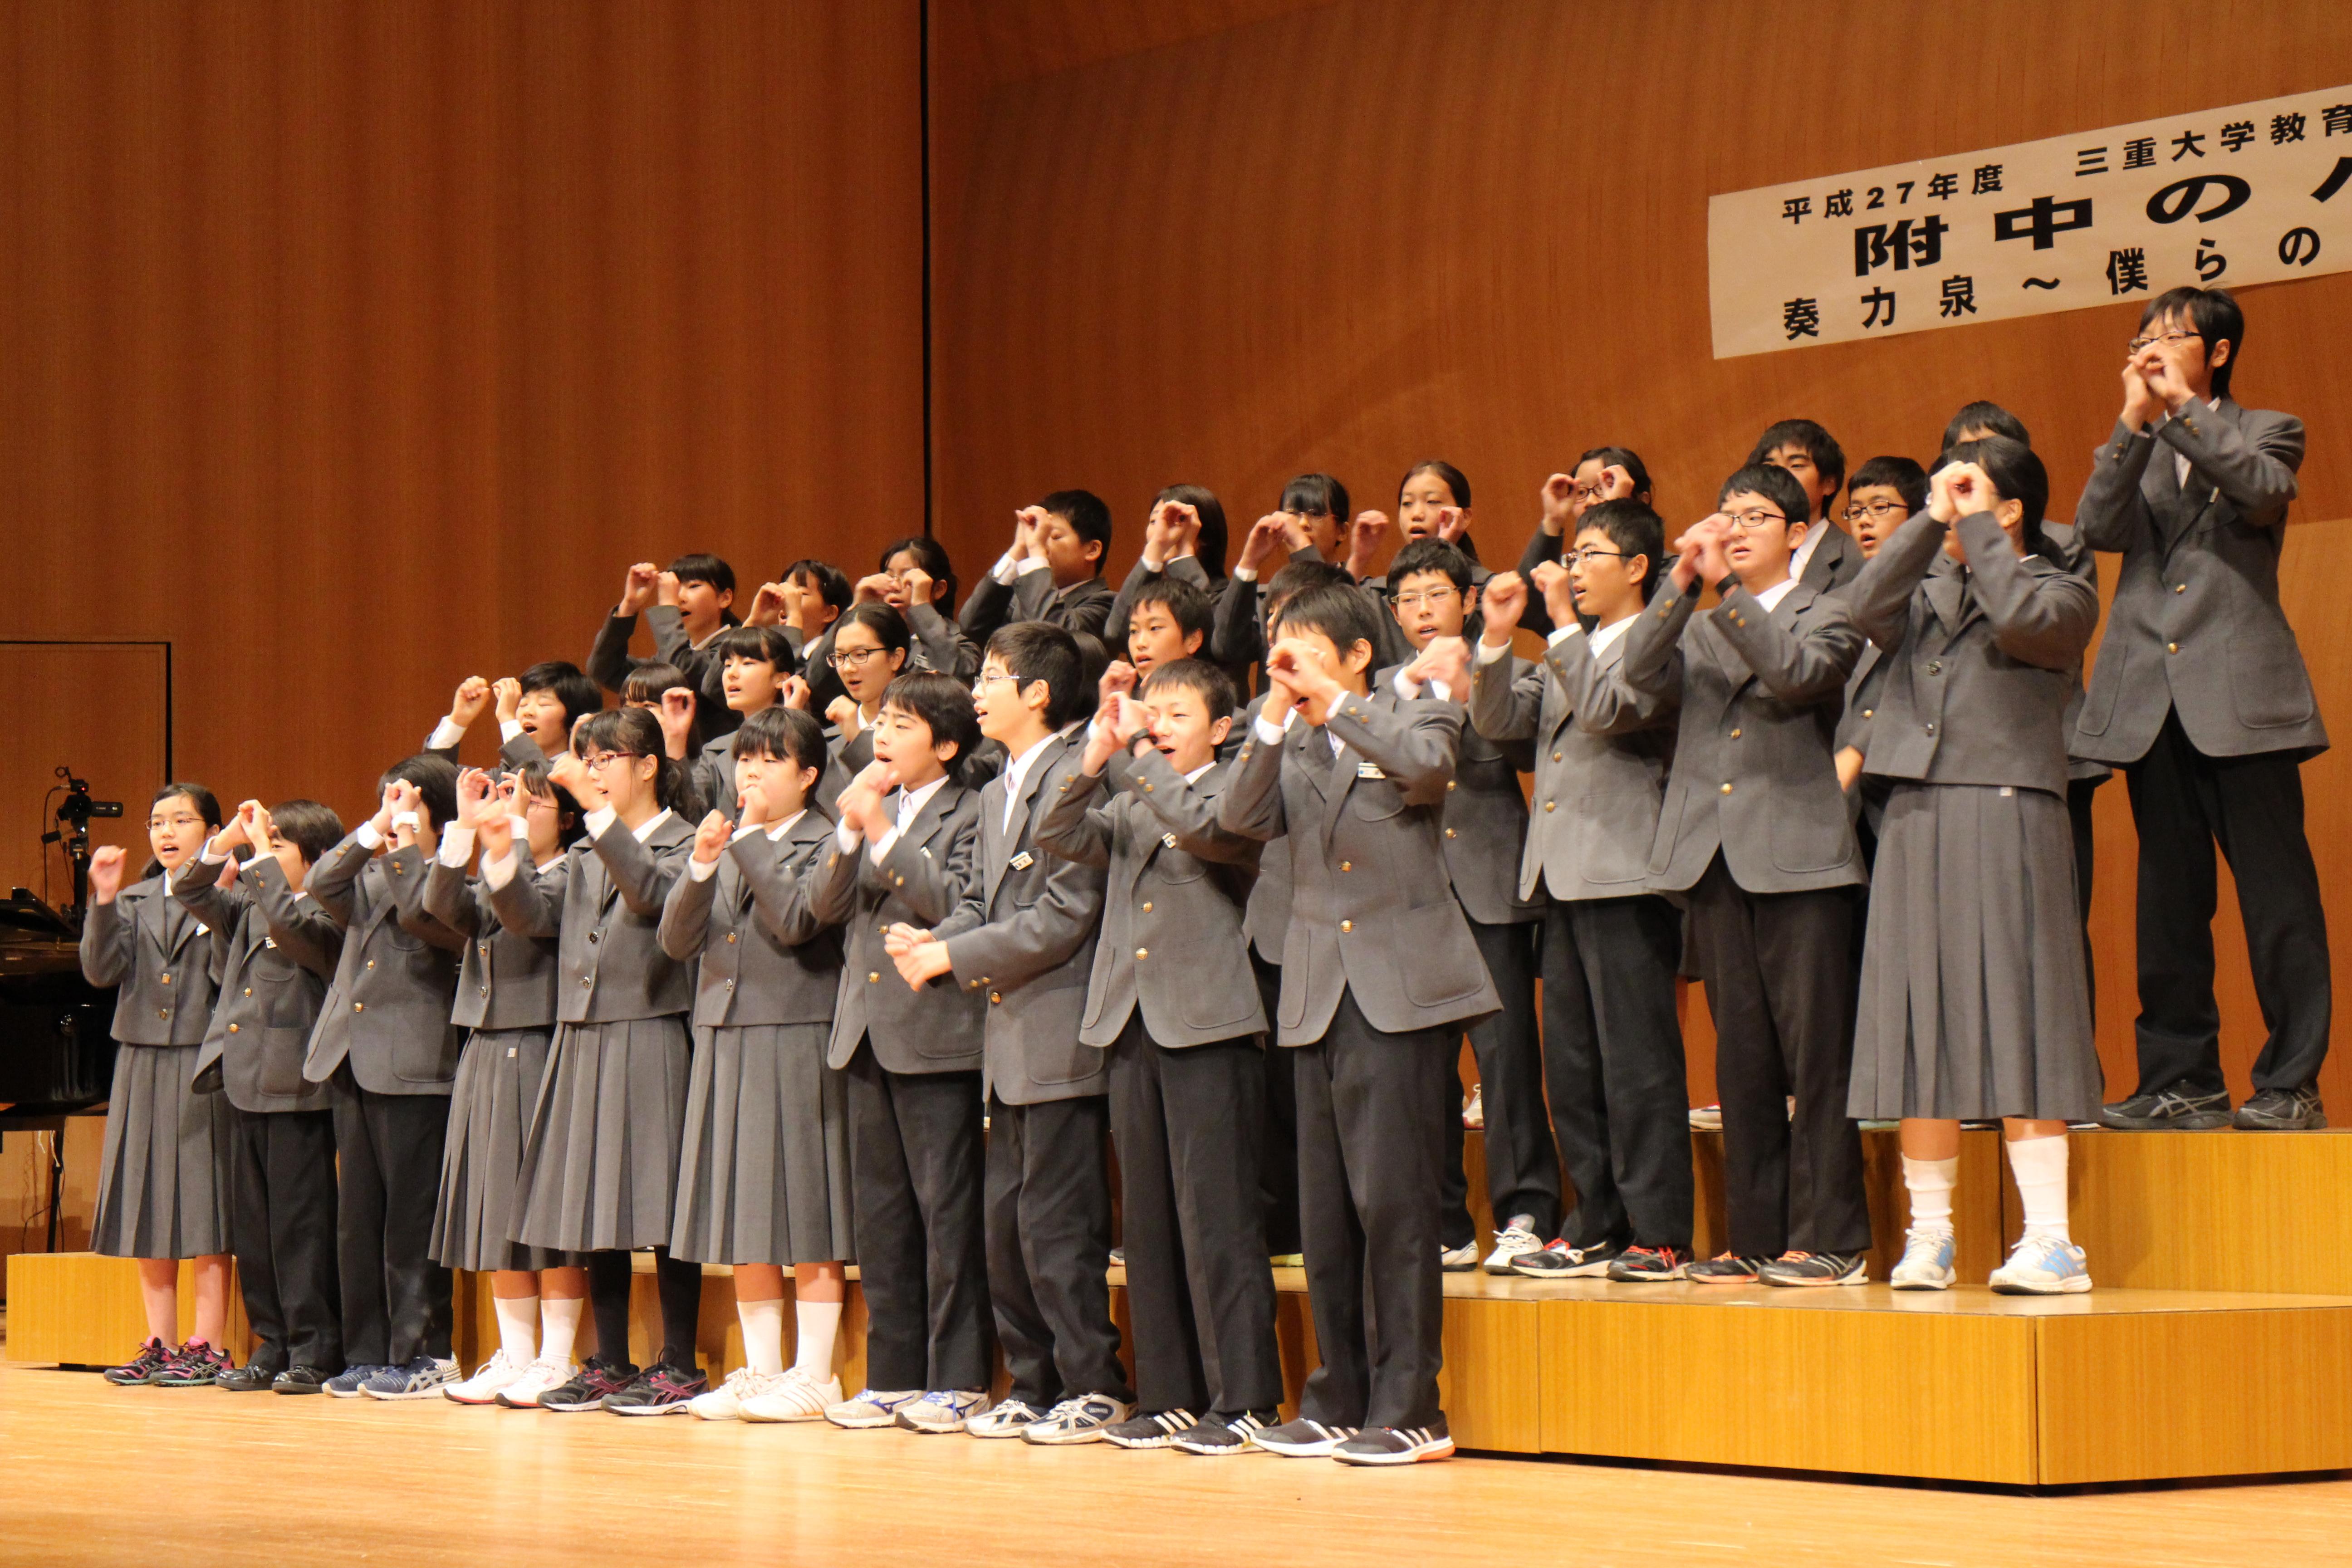 http://www.fuzoku.edu.mie-u.ac.jp/chu/IMG_2411.JPG